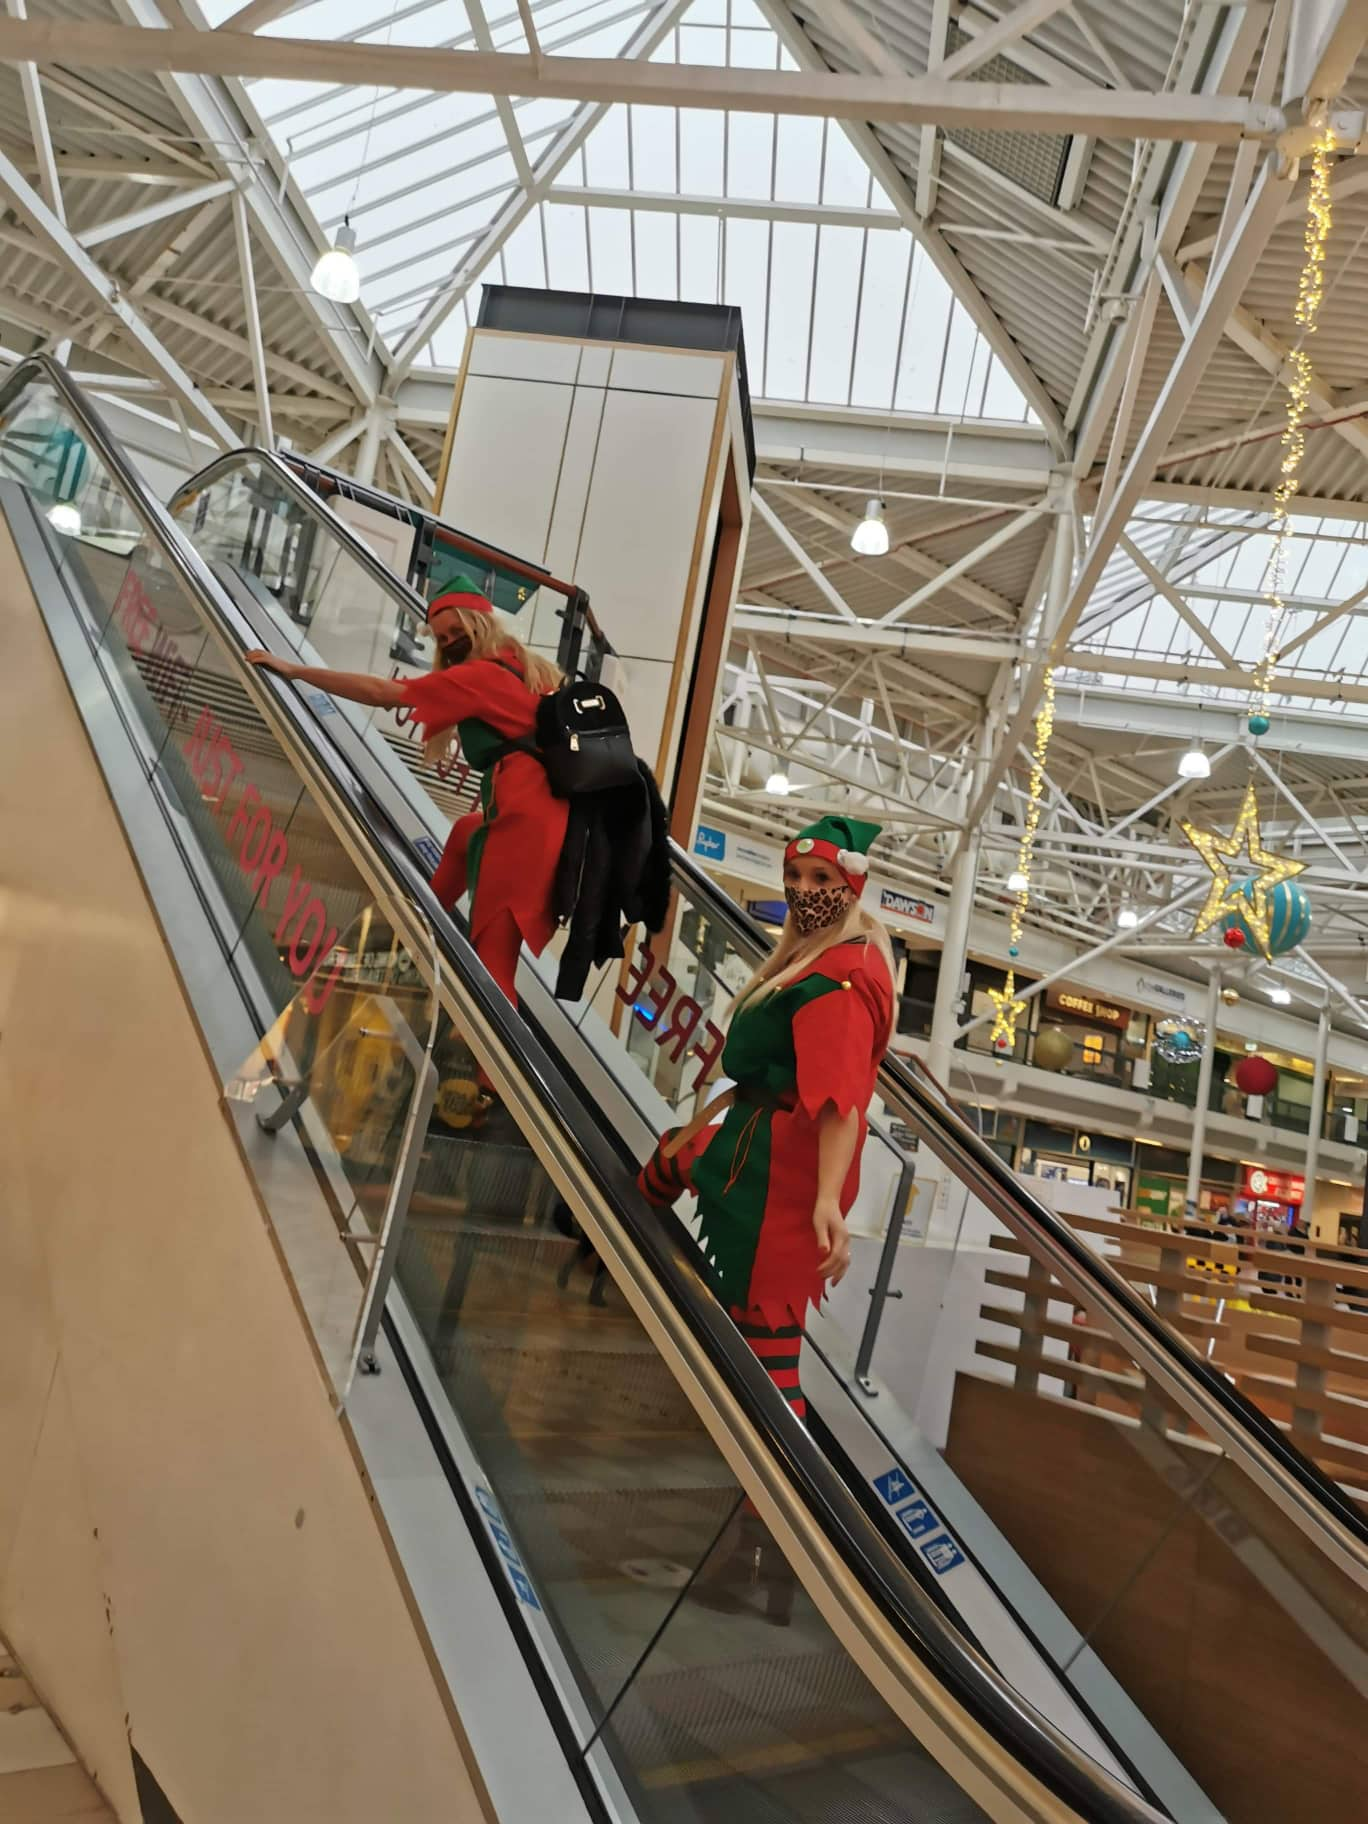 Two women as elves on esculator